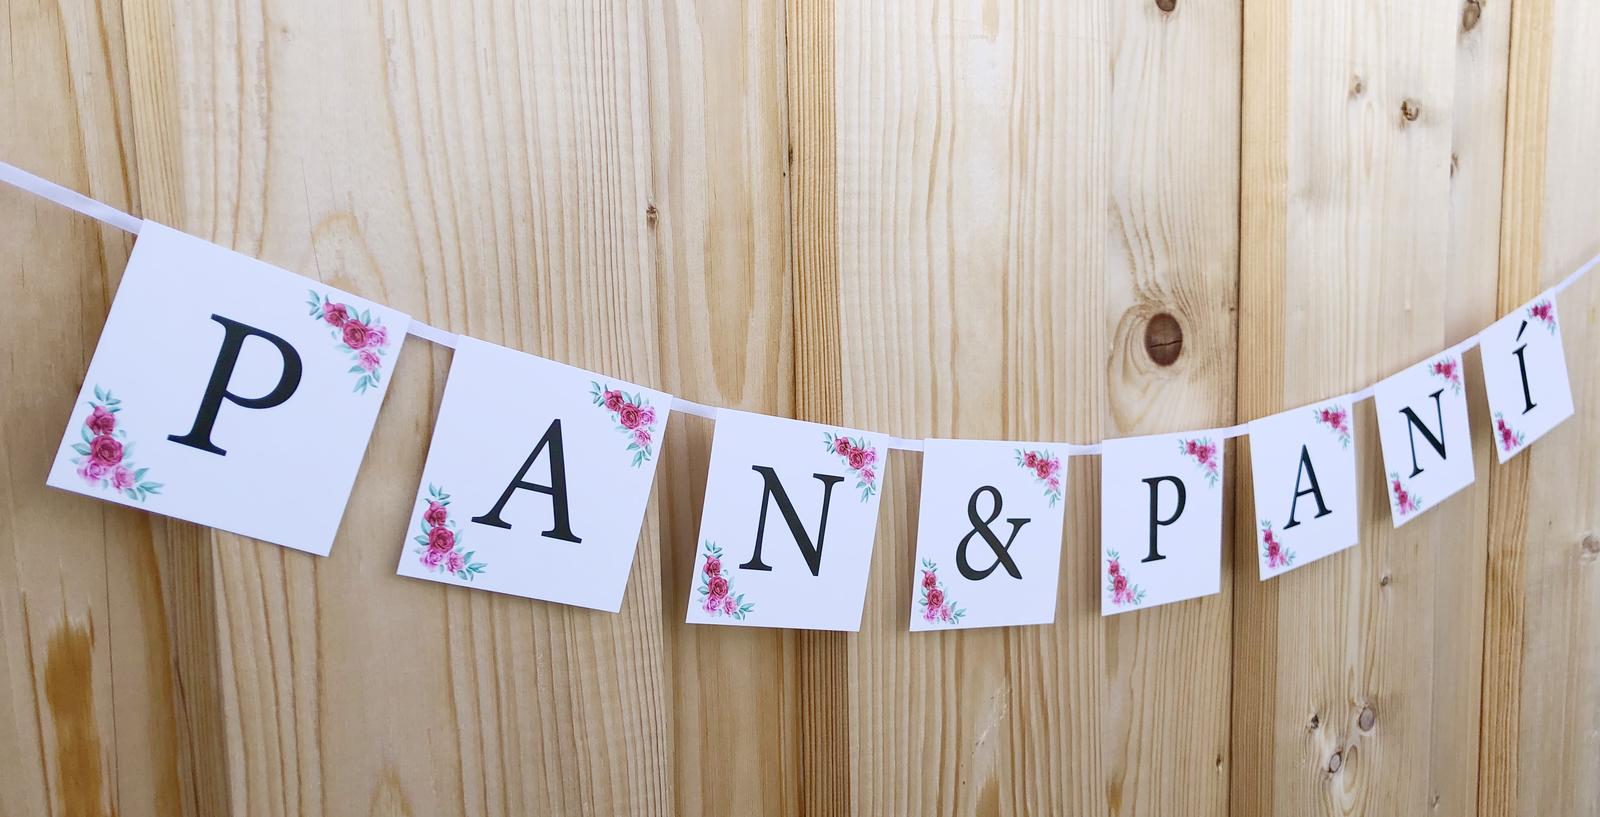 Girlanda PAN&PANÍ bílá s růžičkami - Obrázek č. 1